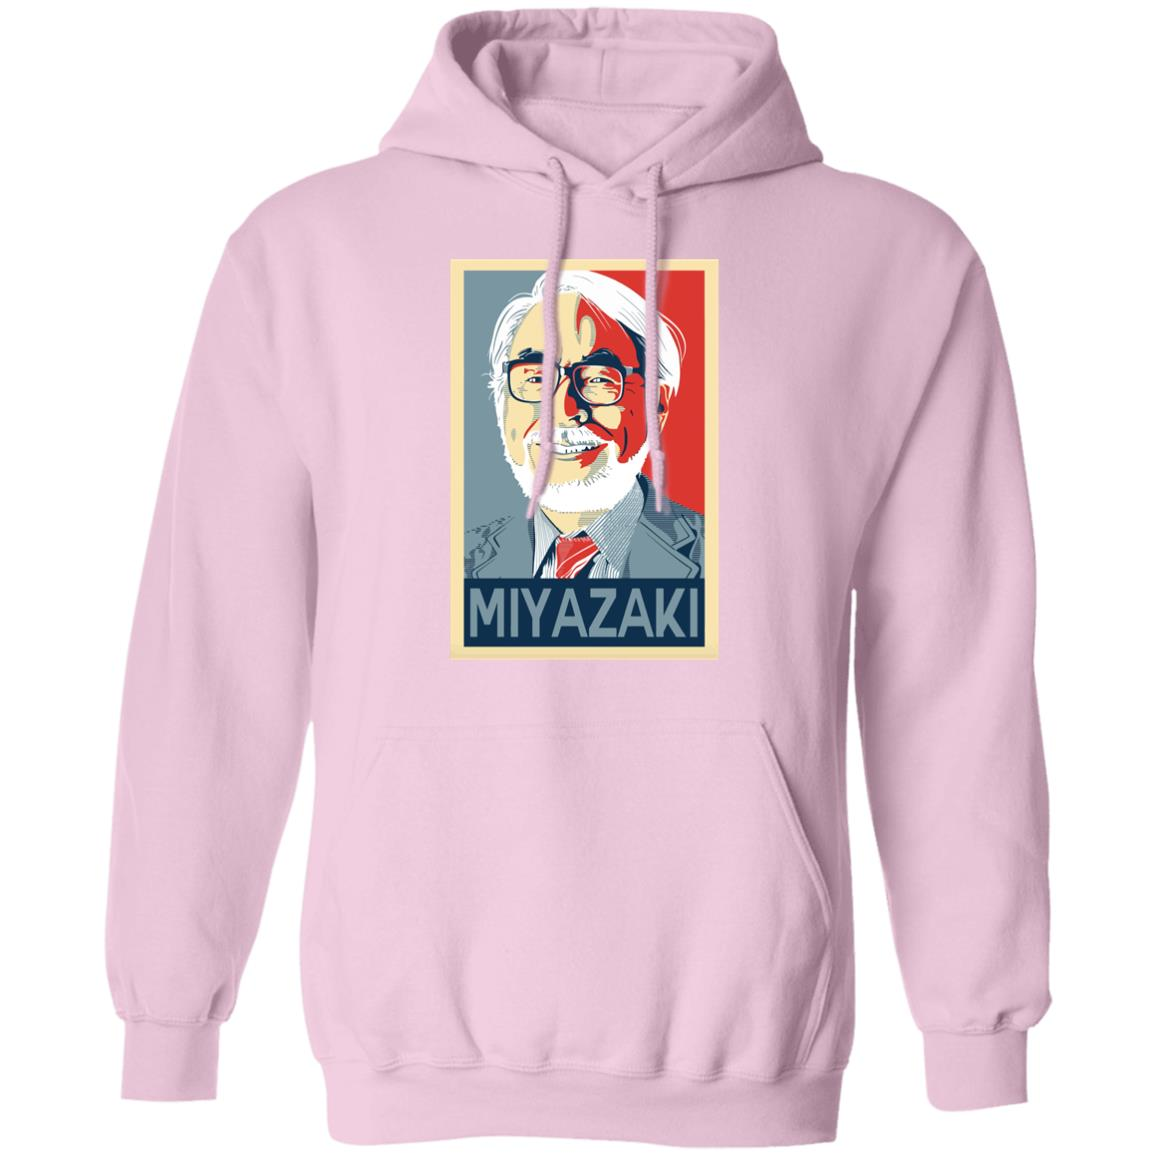 Hayao Miyazaki Studio Ghibli Hoodie